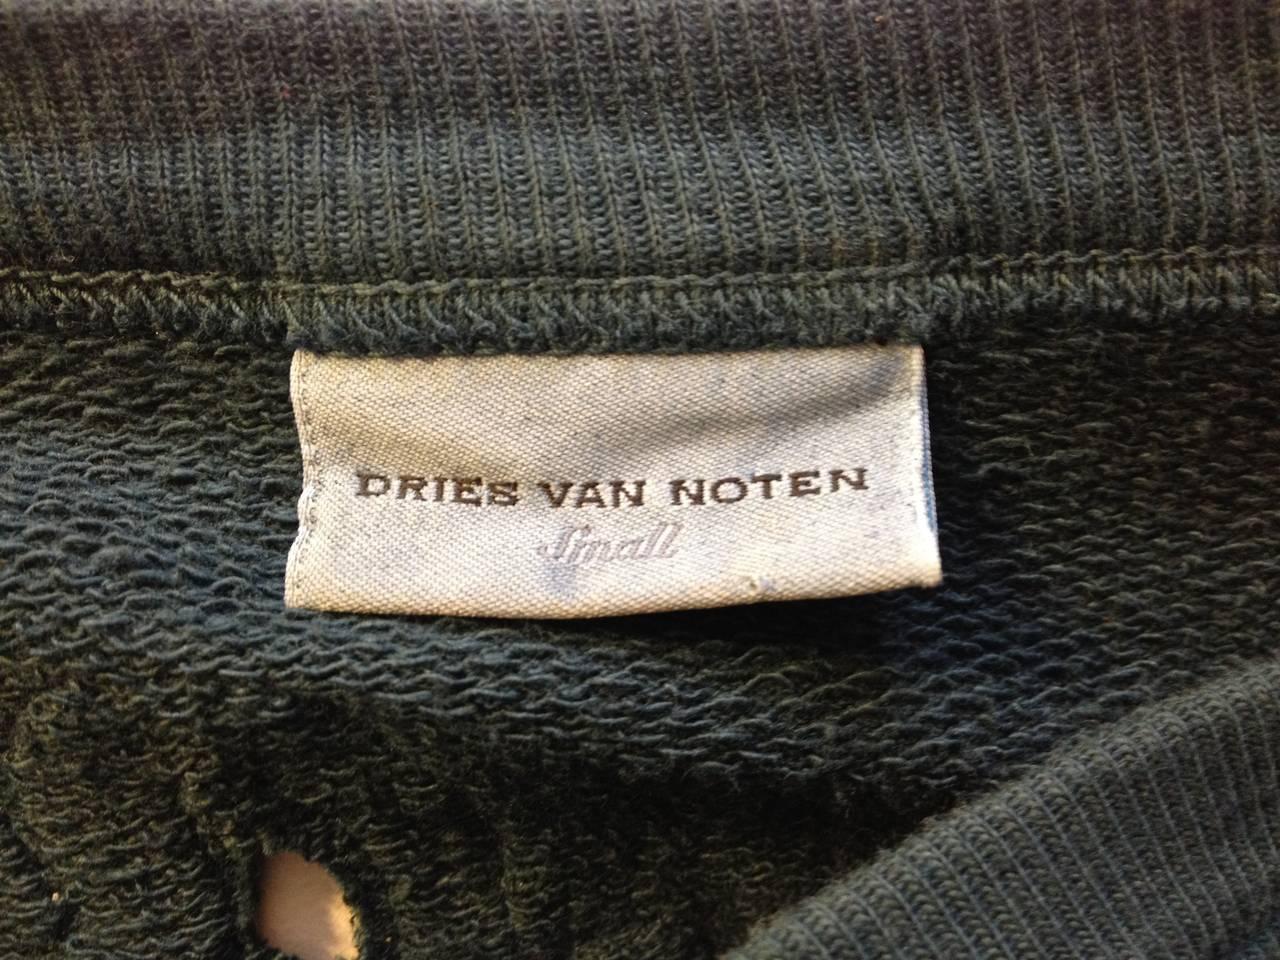 Dries Van Noten Teal Green Cutout Embroidered Sweatshirt 7